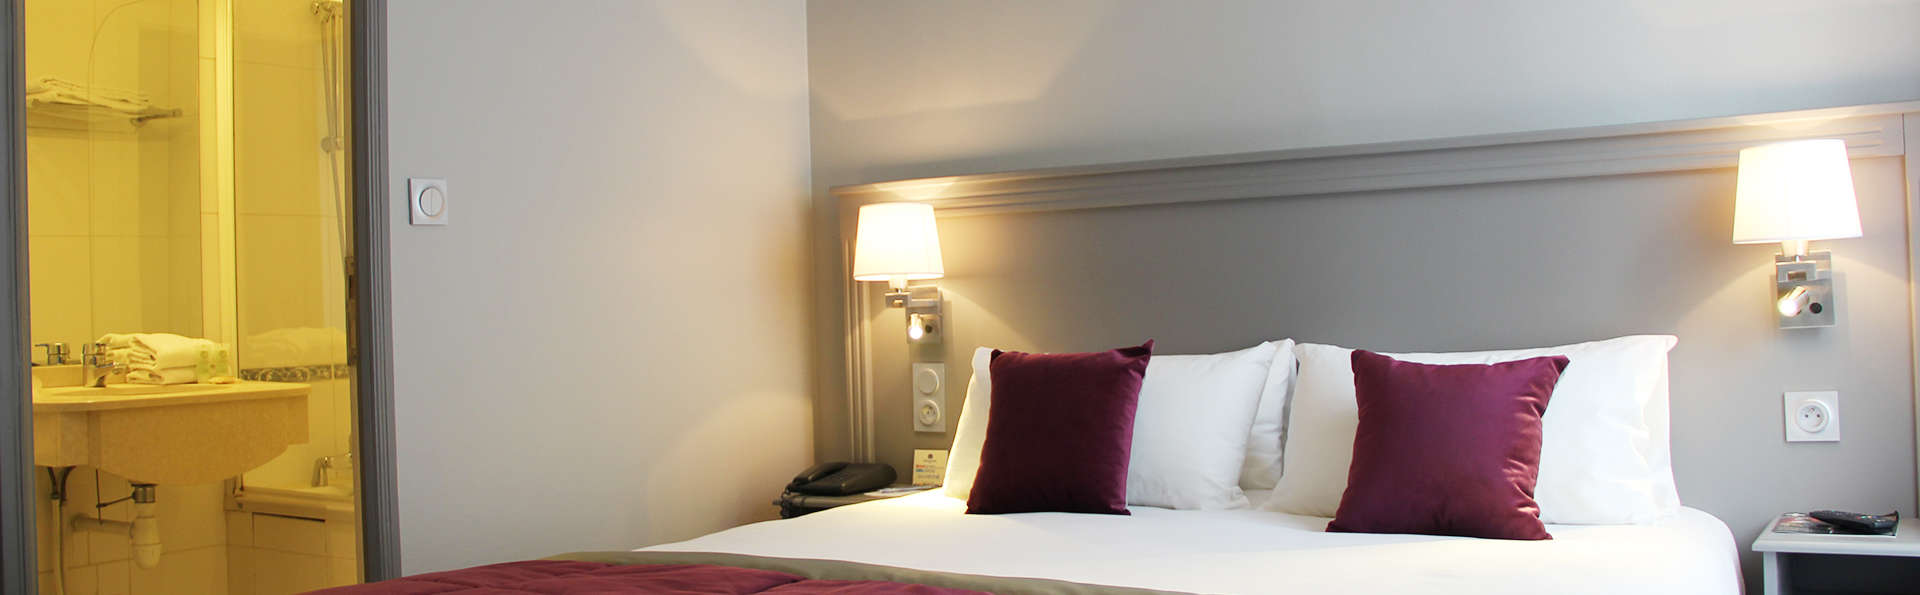 Best Western Hôtel Montcalm - EDIT_room2.jpg